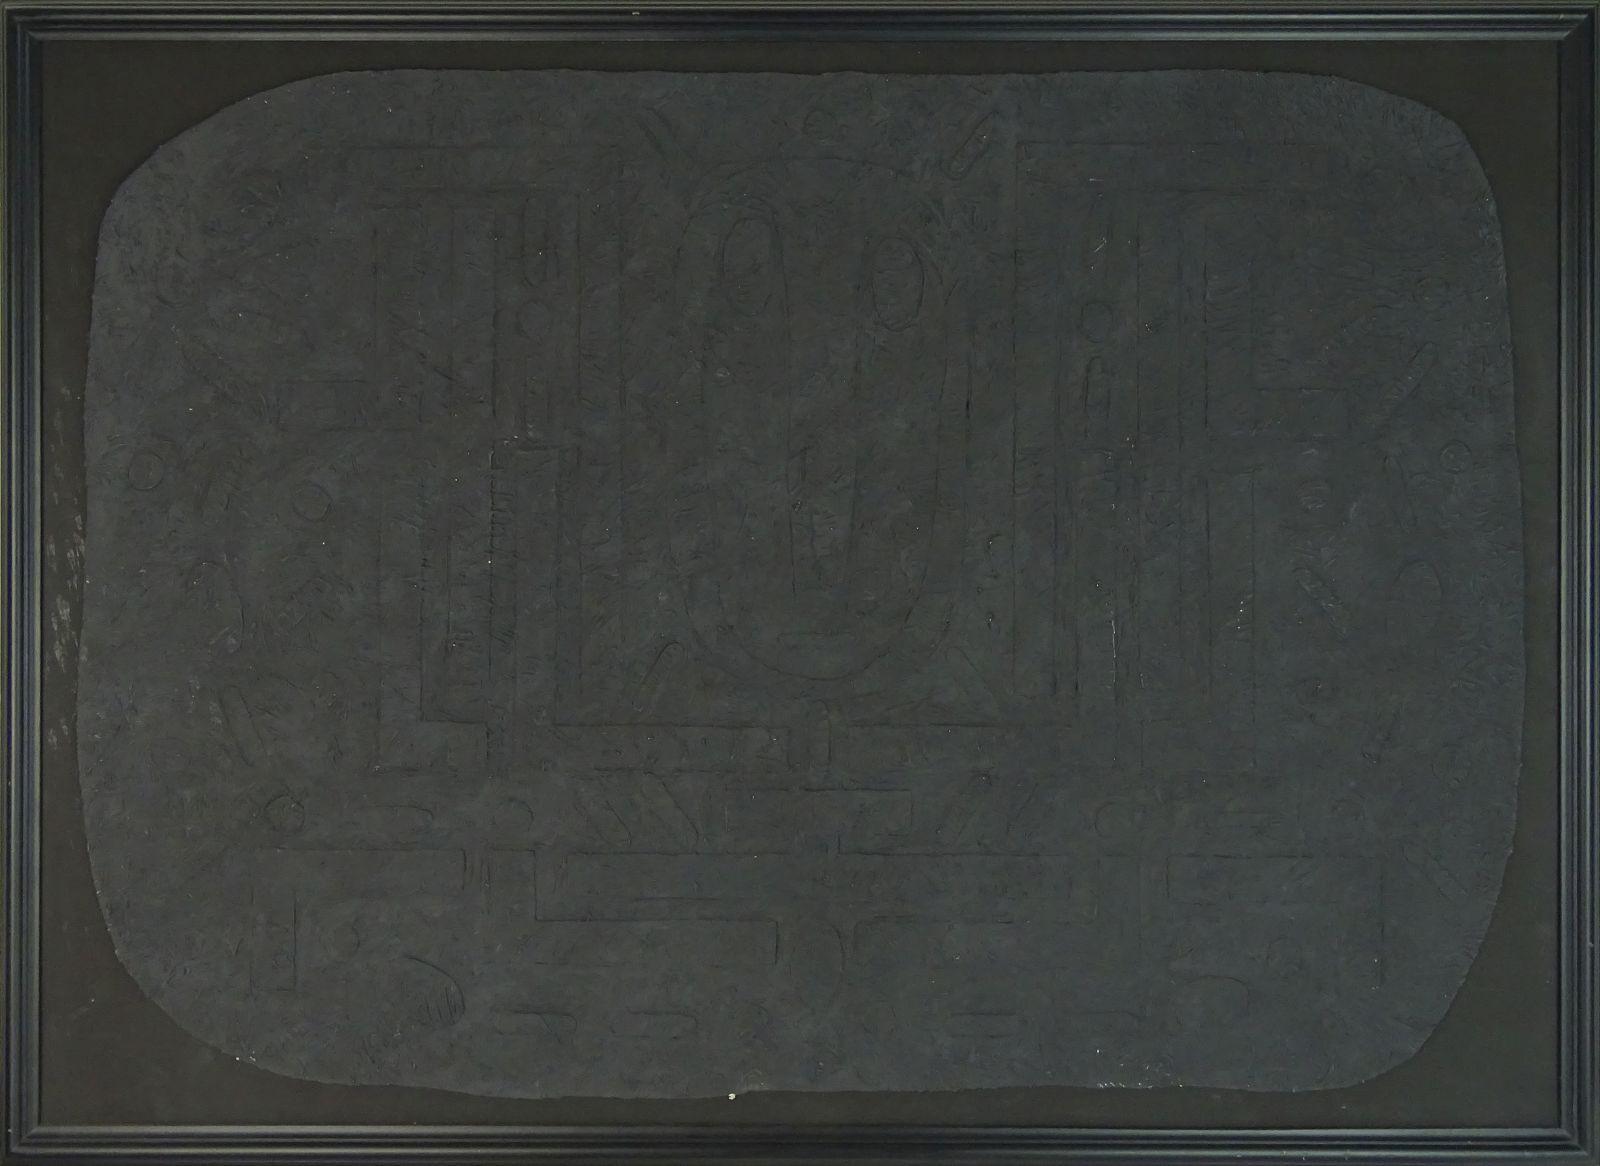 DSC09308.JPG (1600×1166)